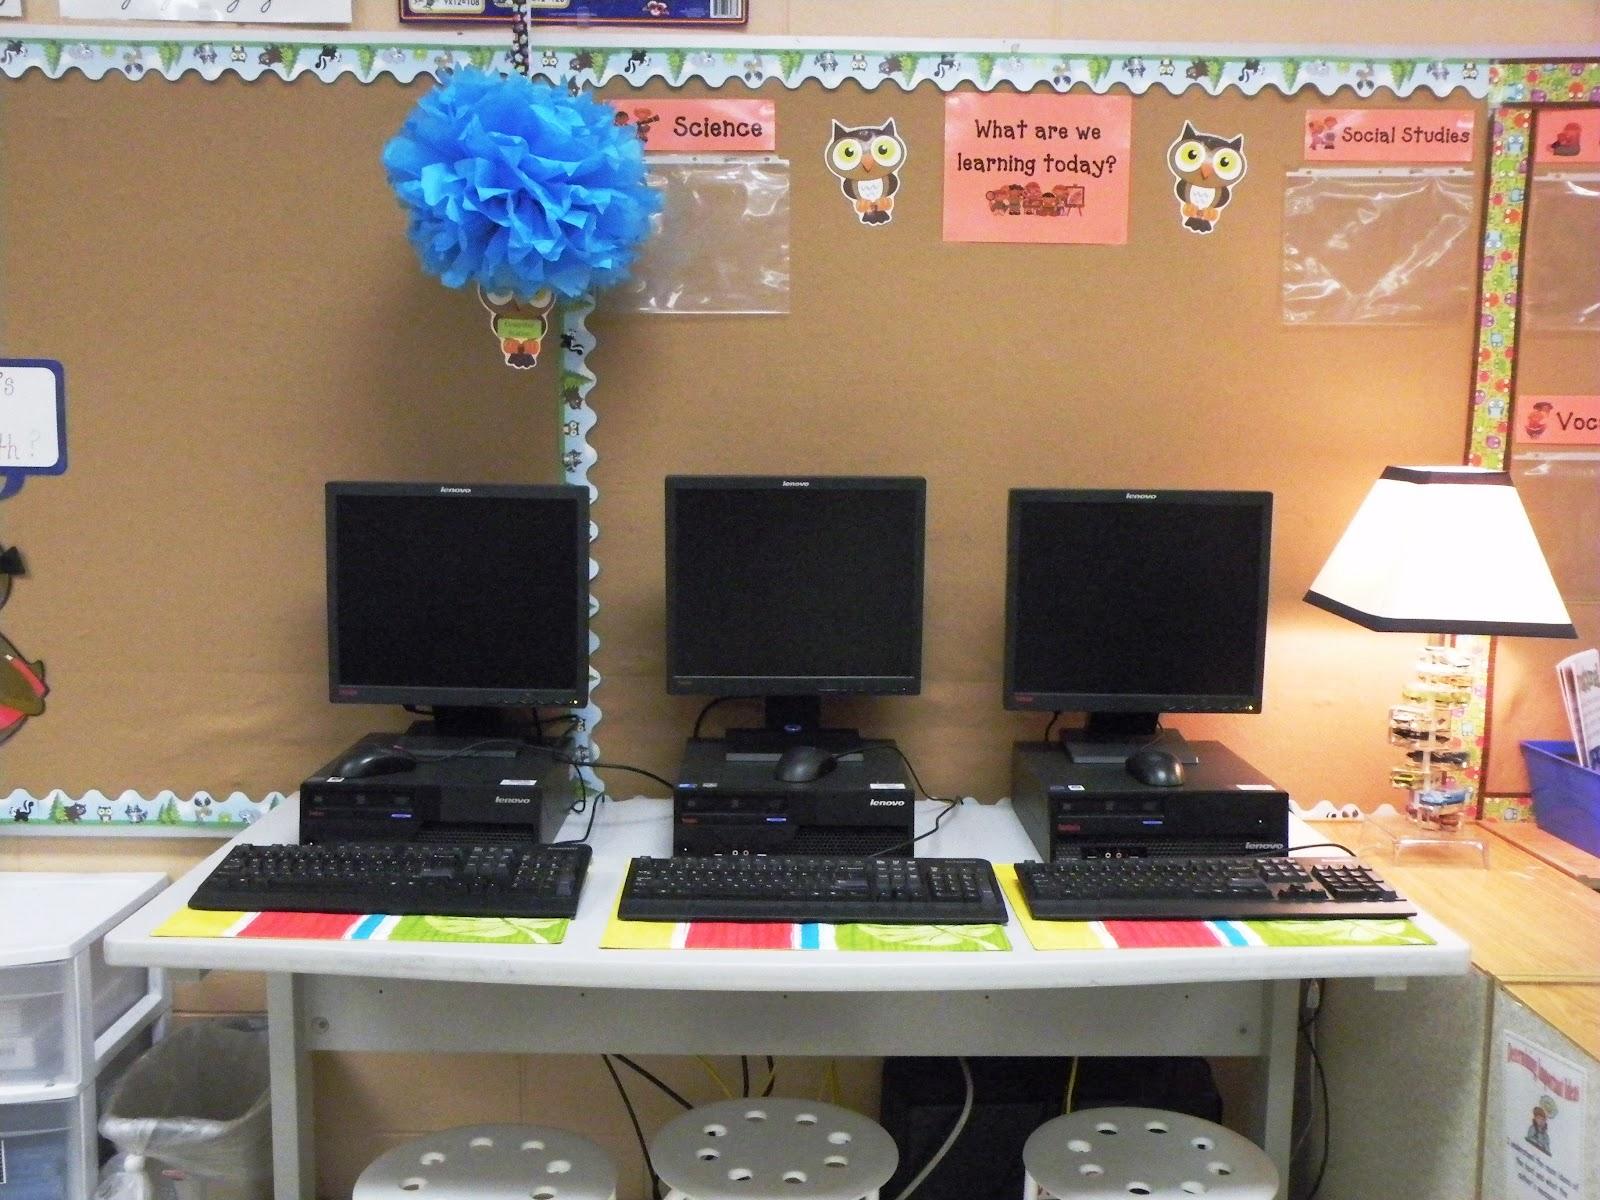 2012 Classroom Set Up on Computer Writing Pad